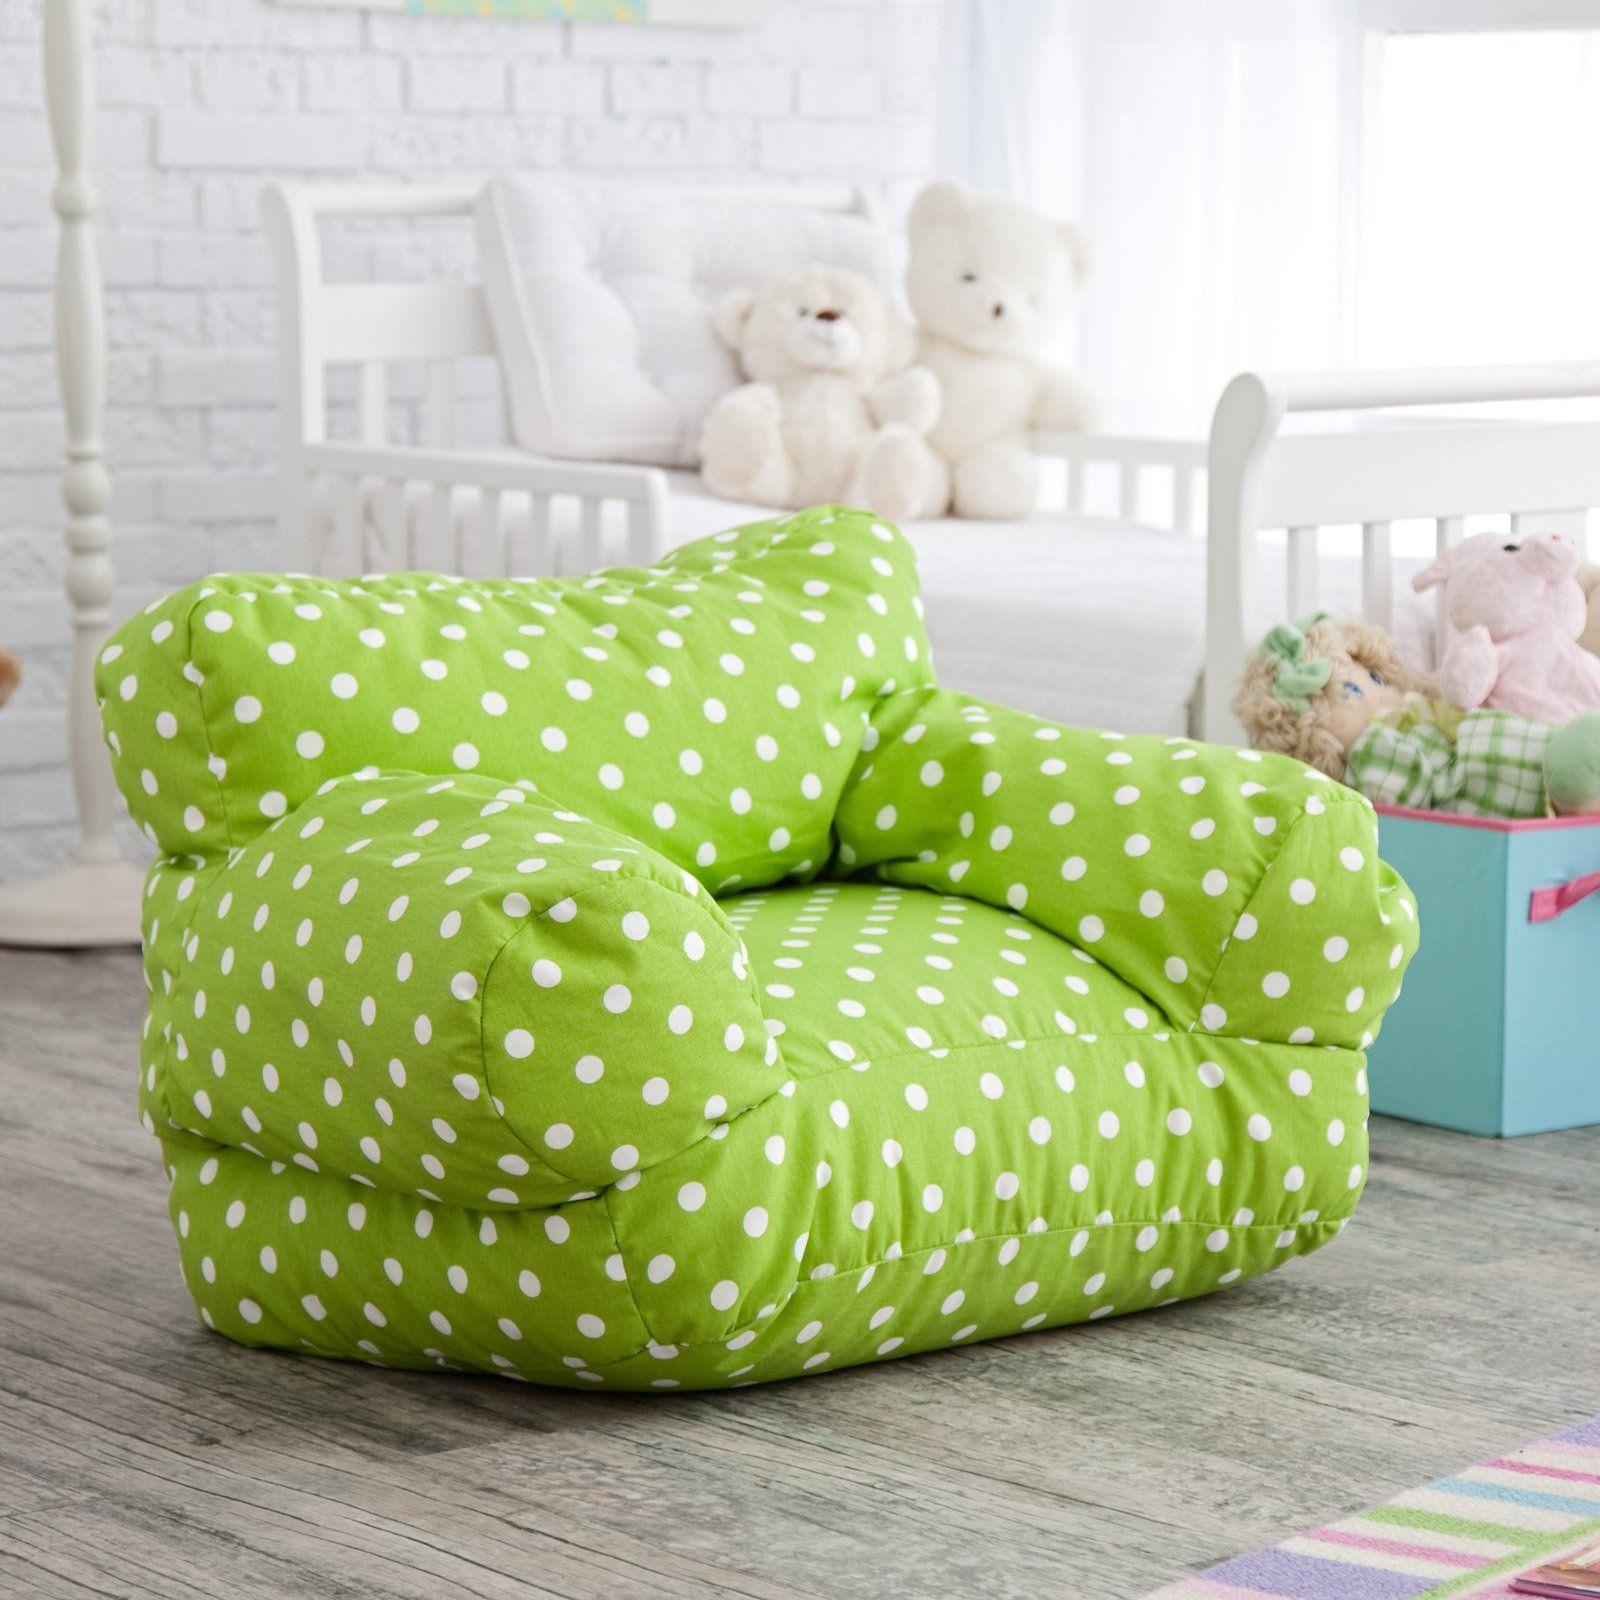 leanback lounger chairs wooden swivel chair uk bean bag gift ideas for miss t pinterest